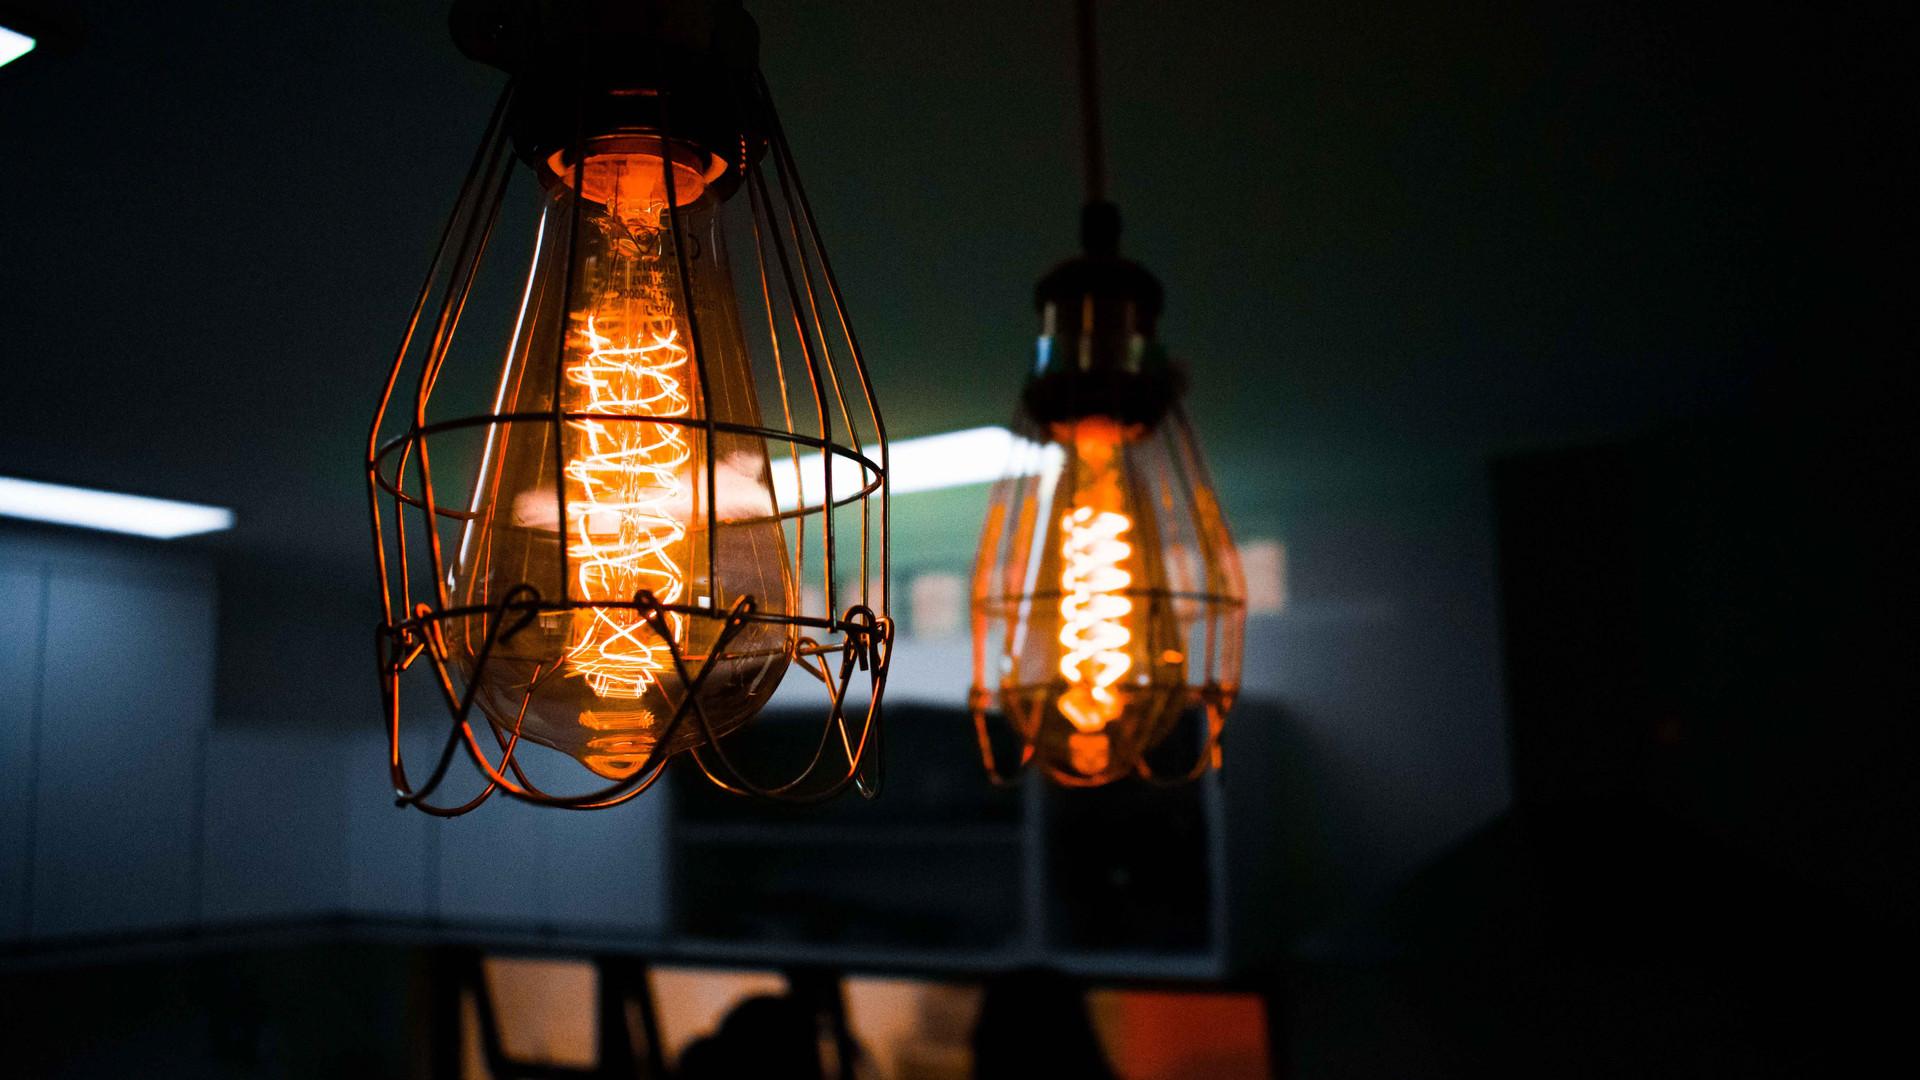 iluminação.jpg